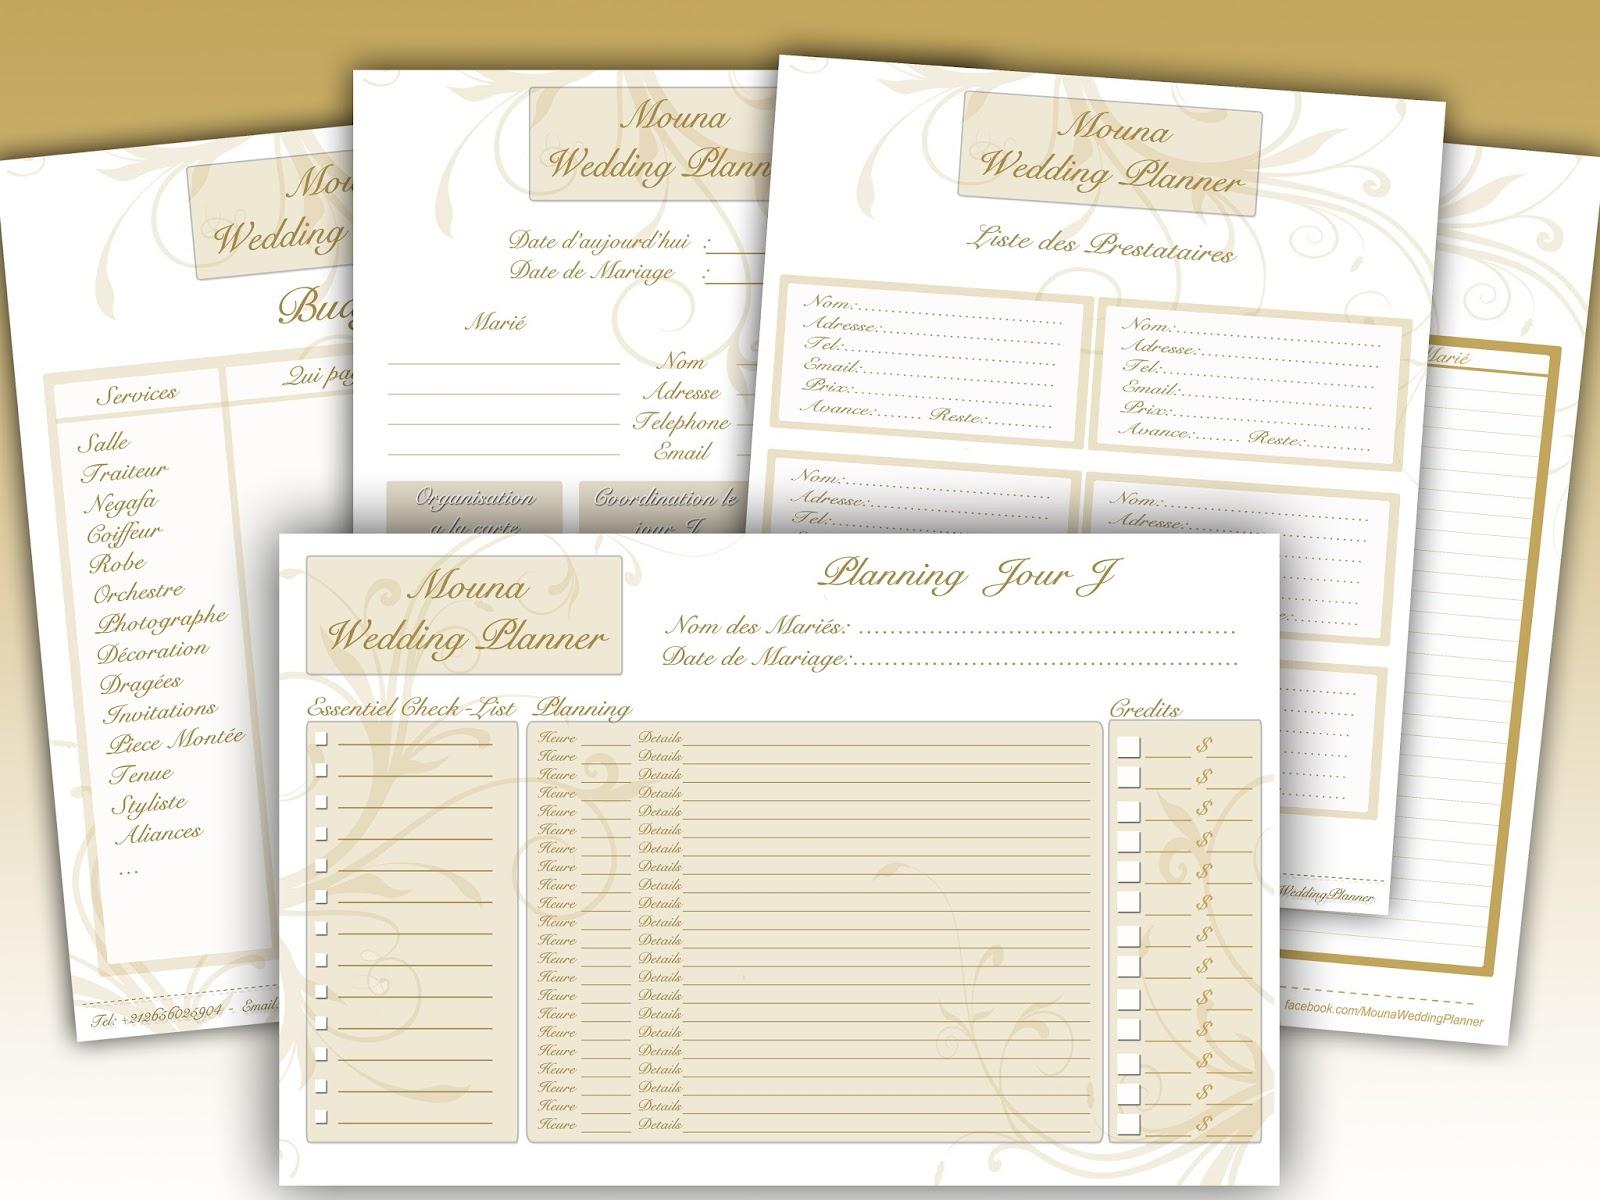 Mariage organisation liste